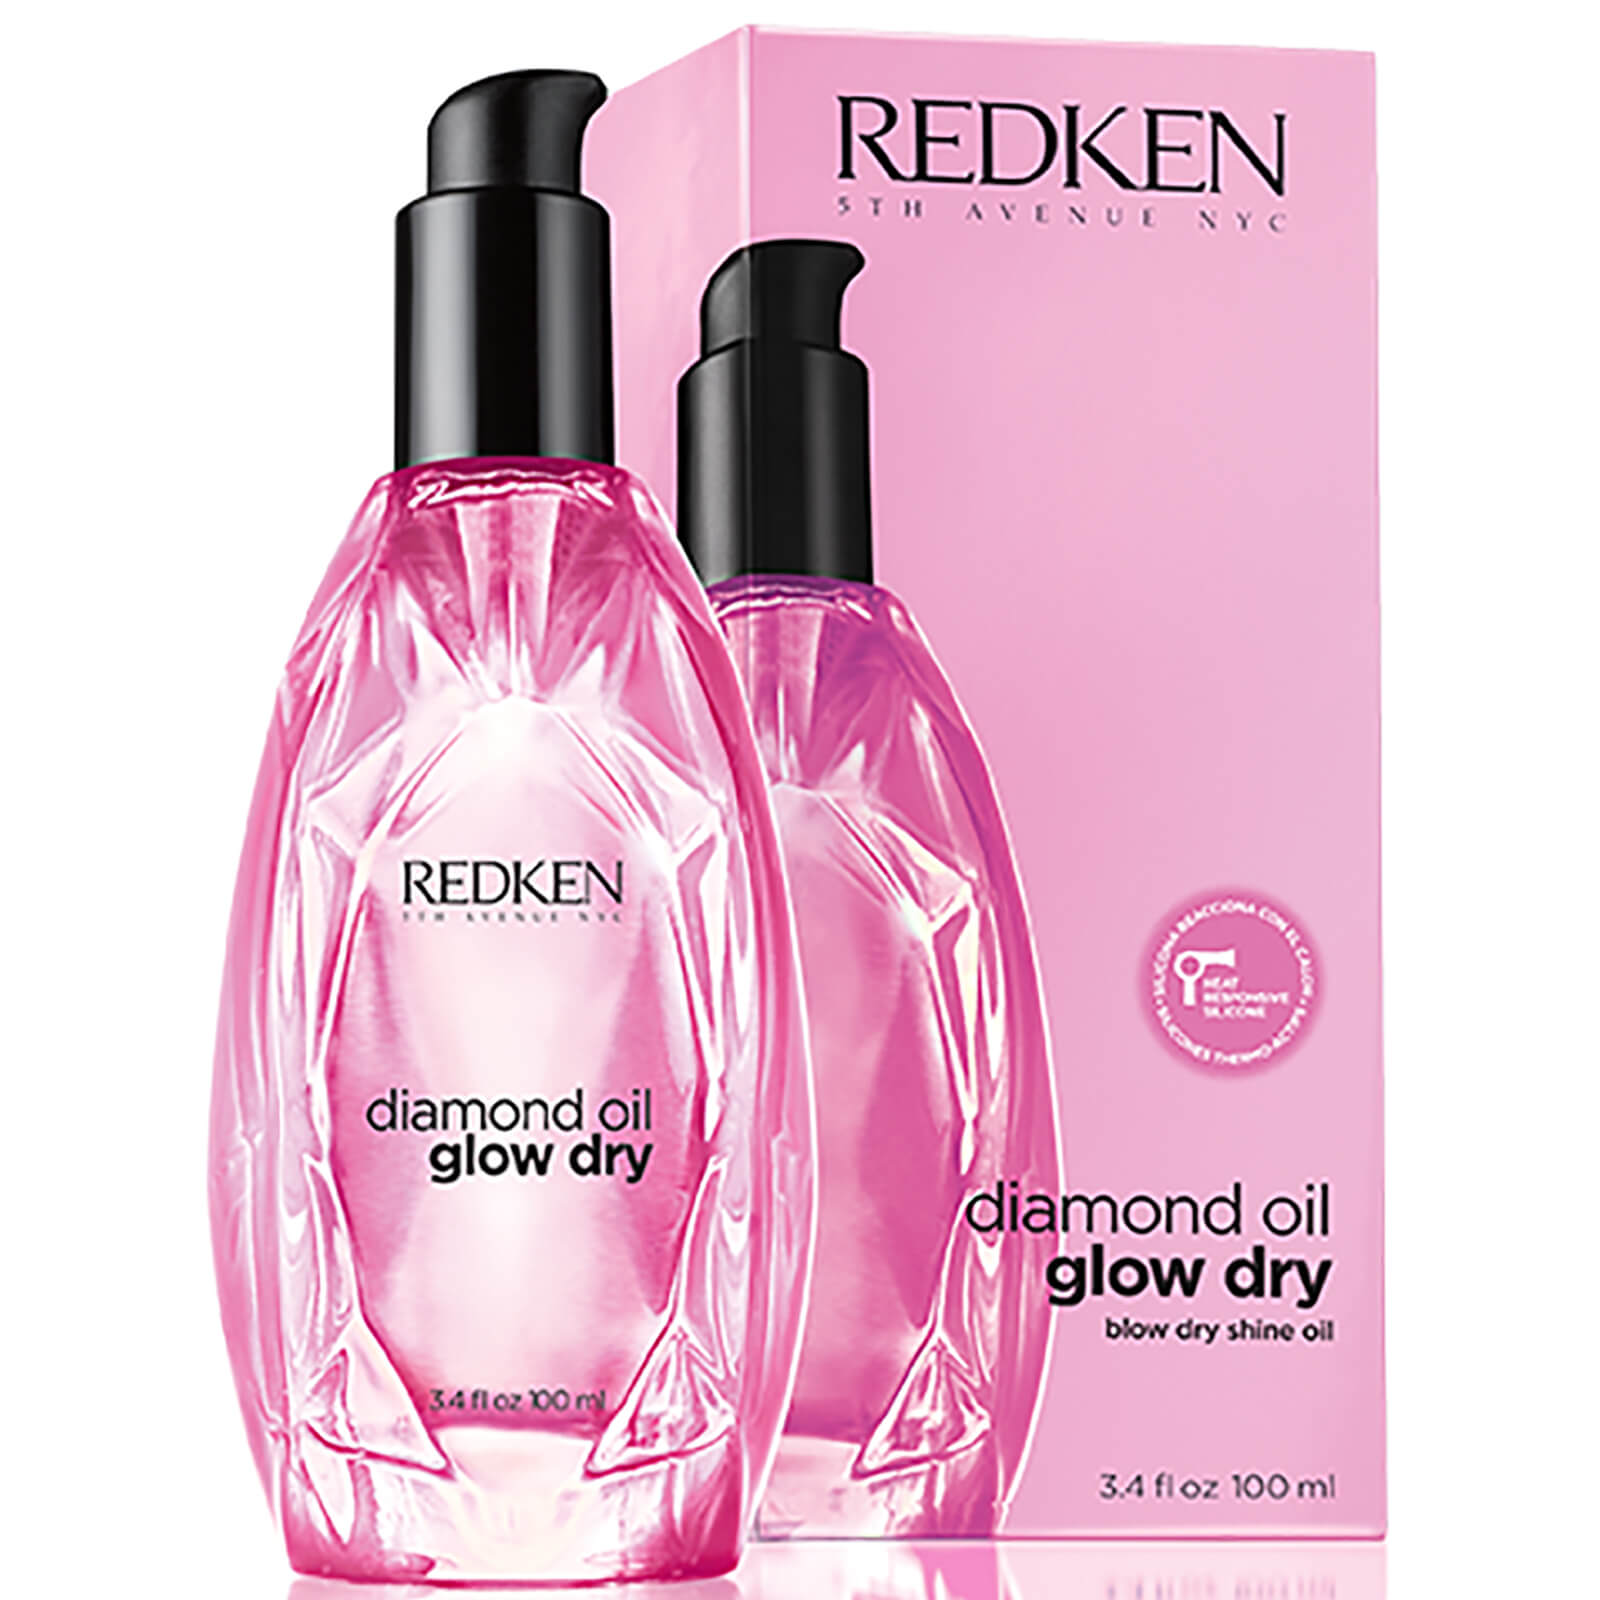 Redken Diamond Oil Glow Dry Style Olio illuminante (100 ml)